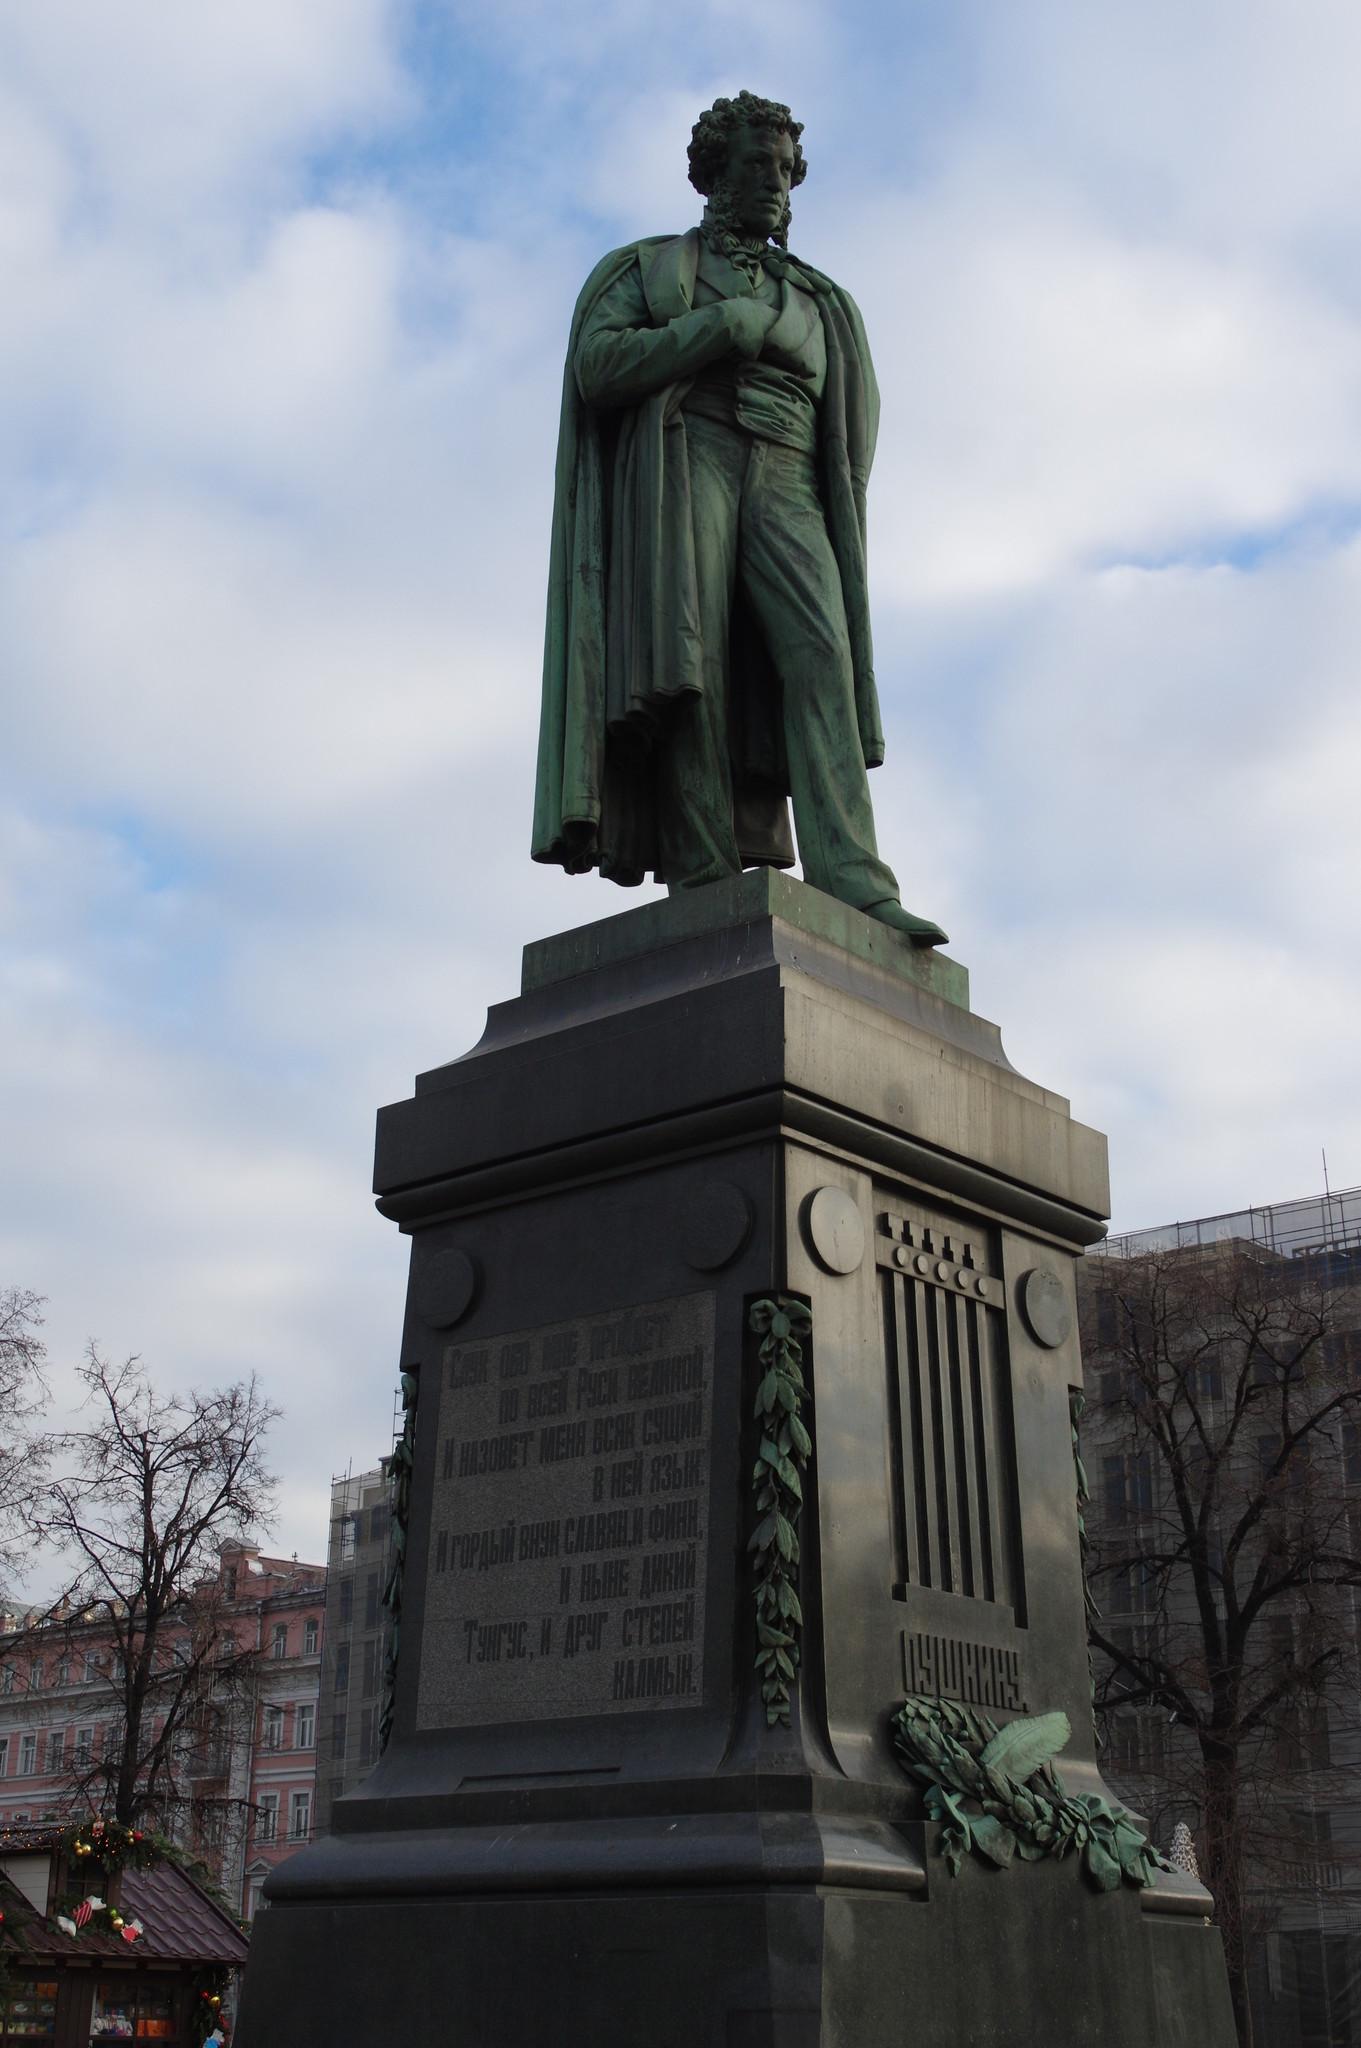 Памятник Александру Сергеевичу Пушкину, работы Александра Михайловича Опекушина